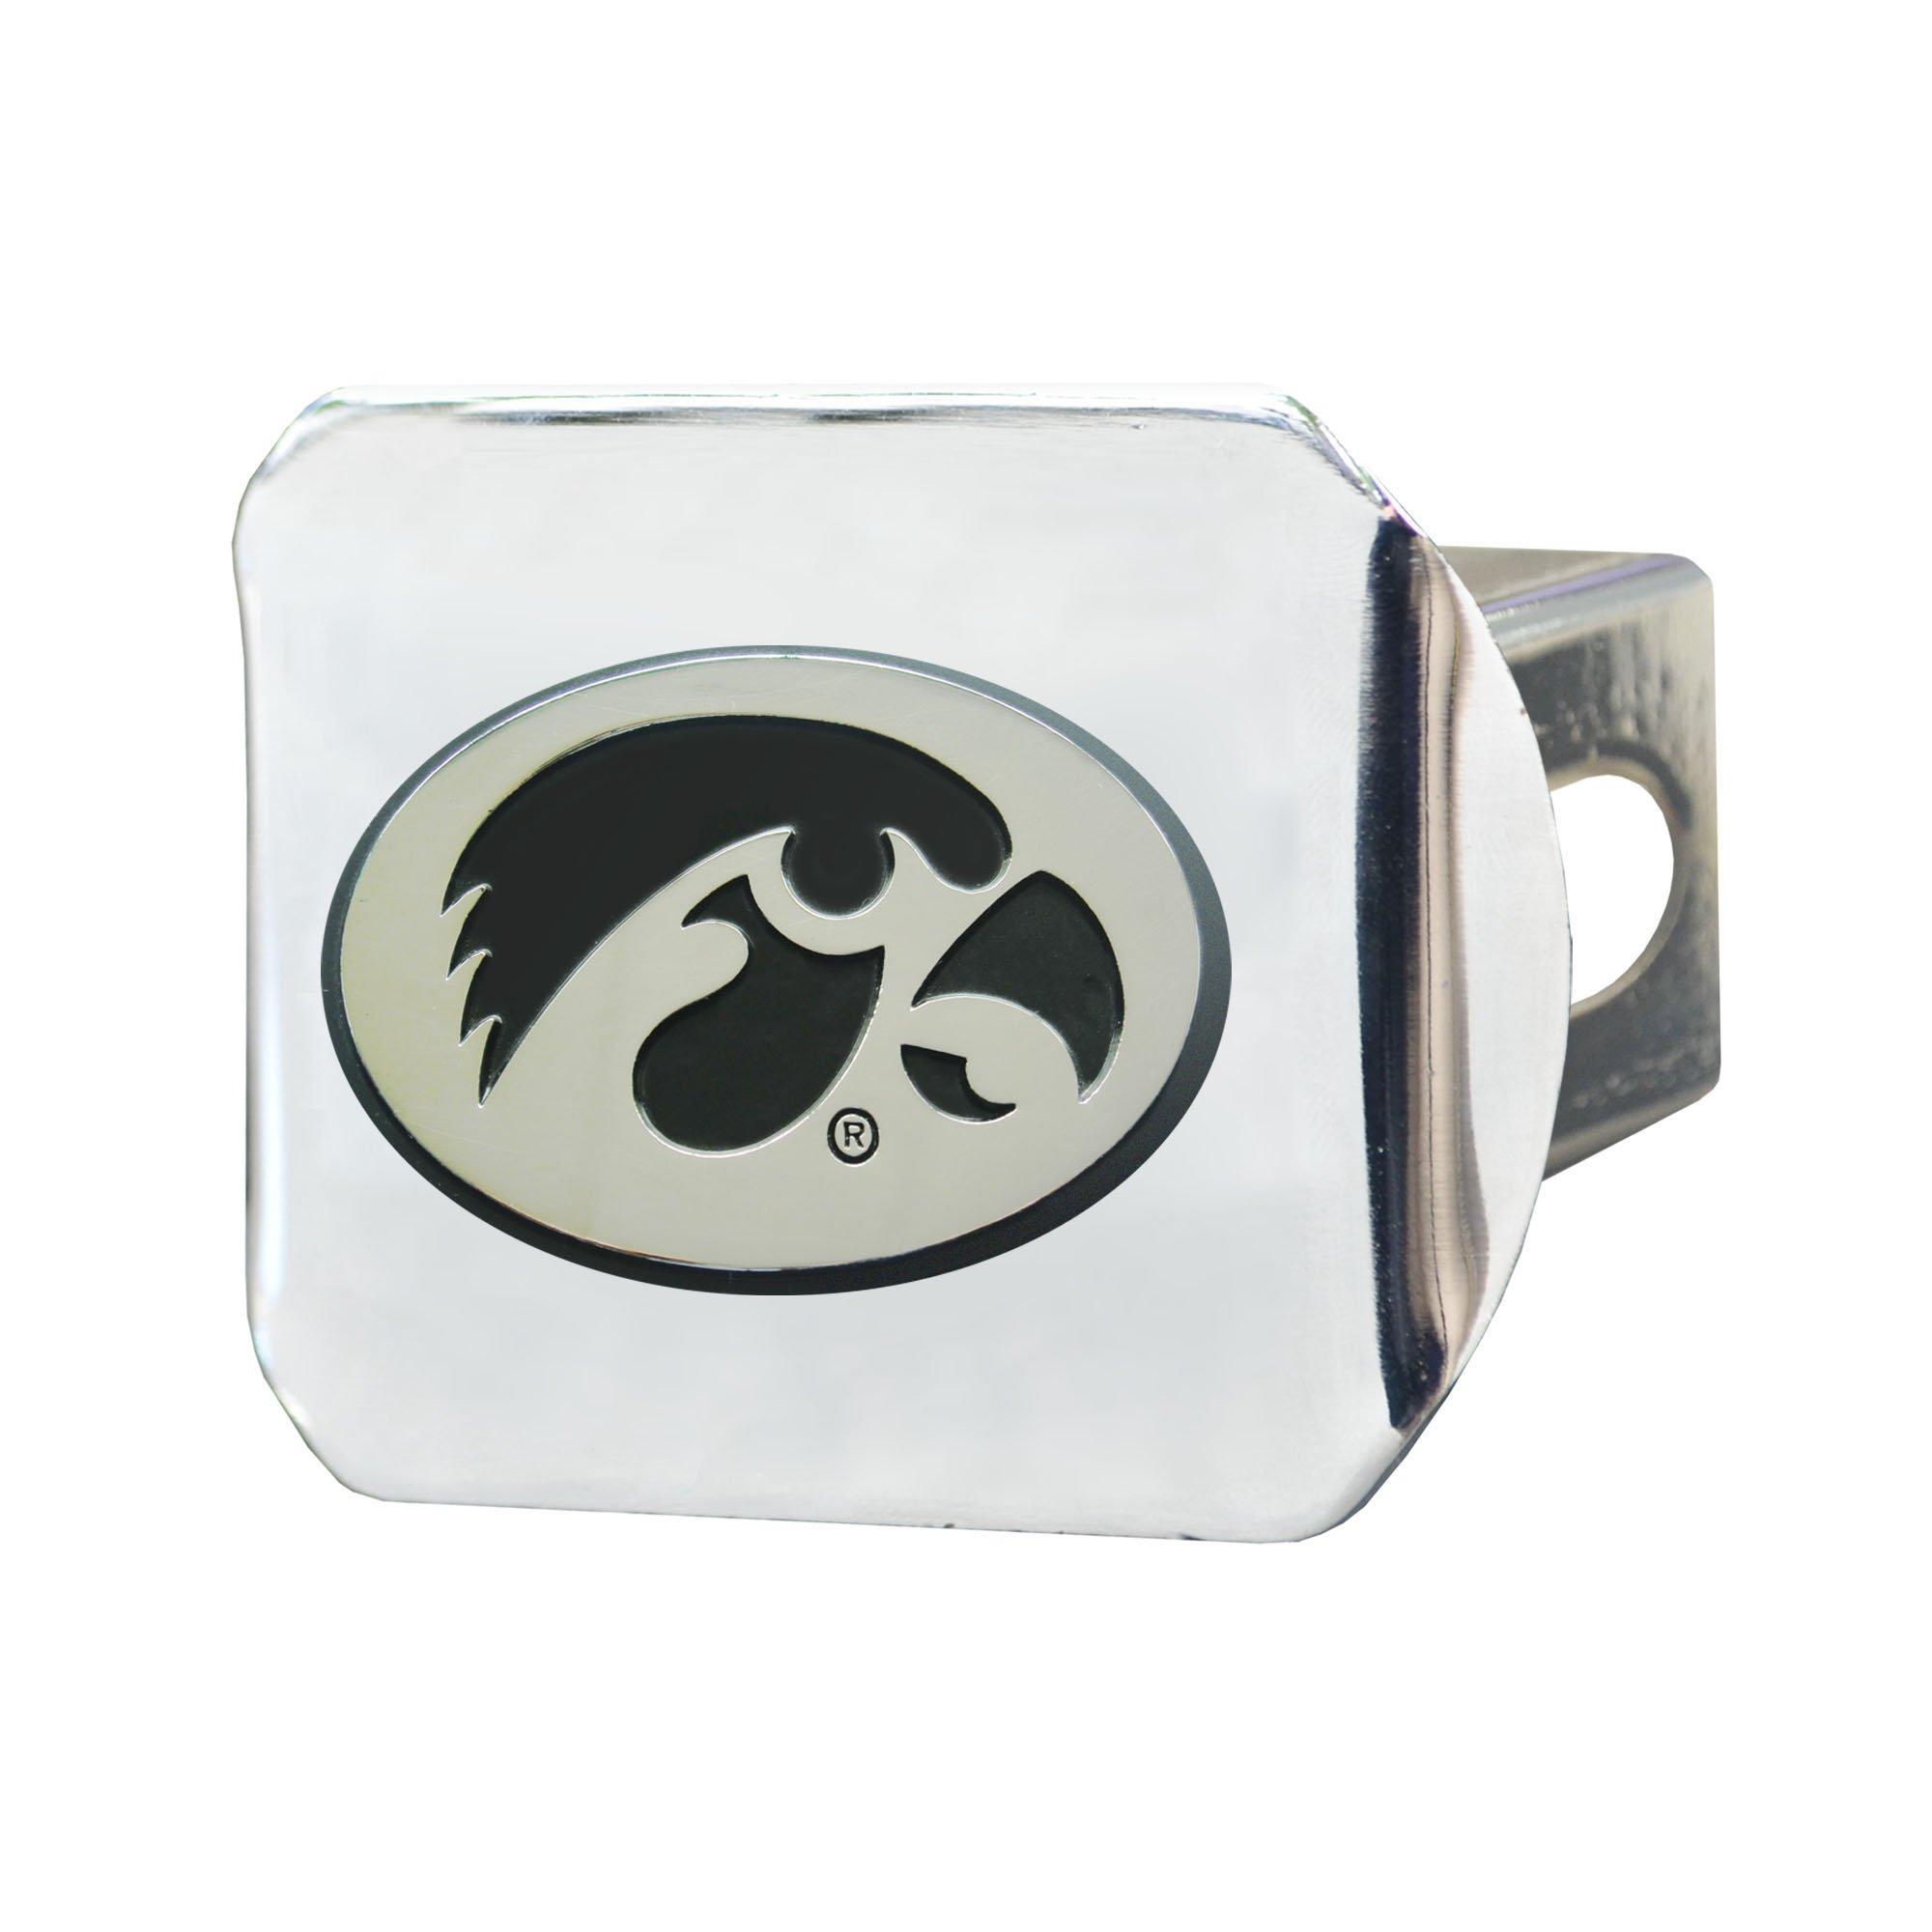 FANMATS NCAA University of Iowa Hawkeyes Chrome Hitch Cover